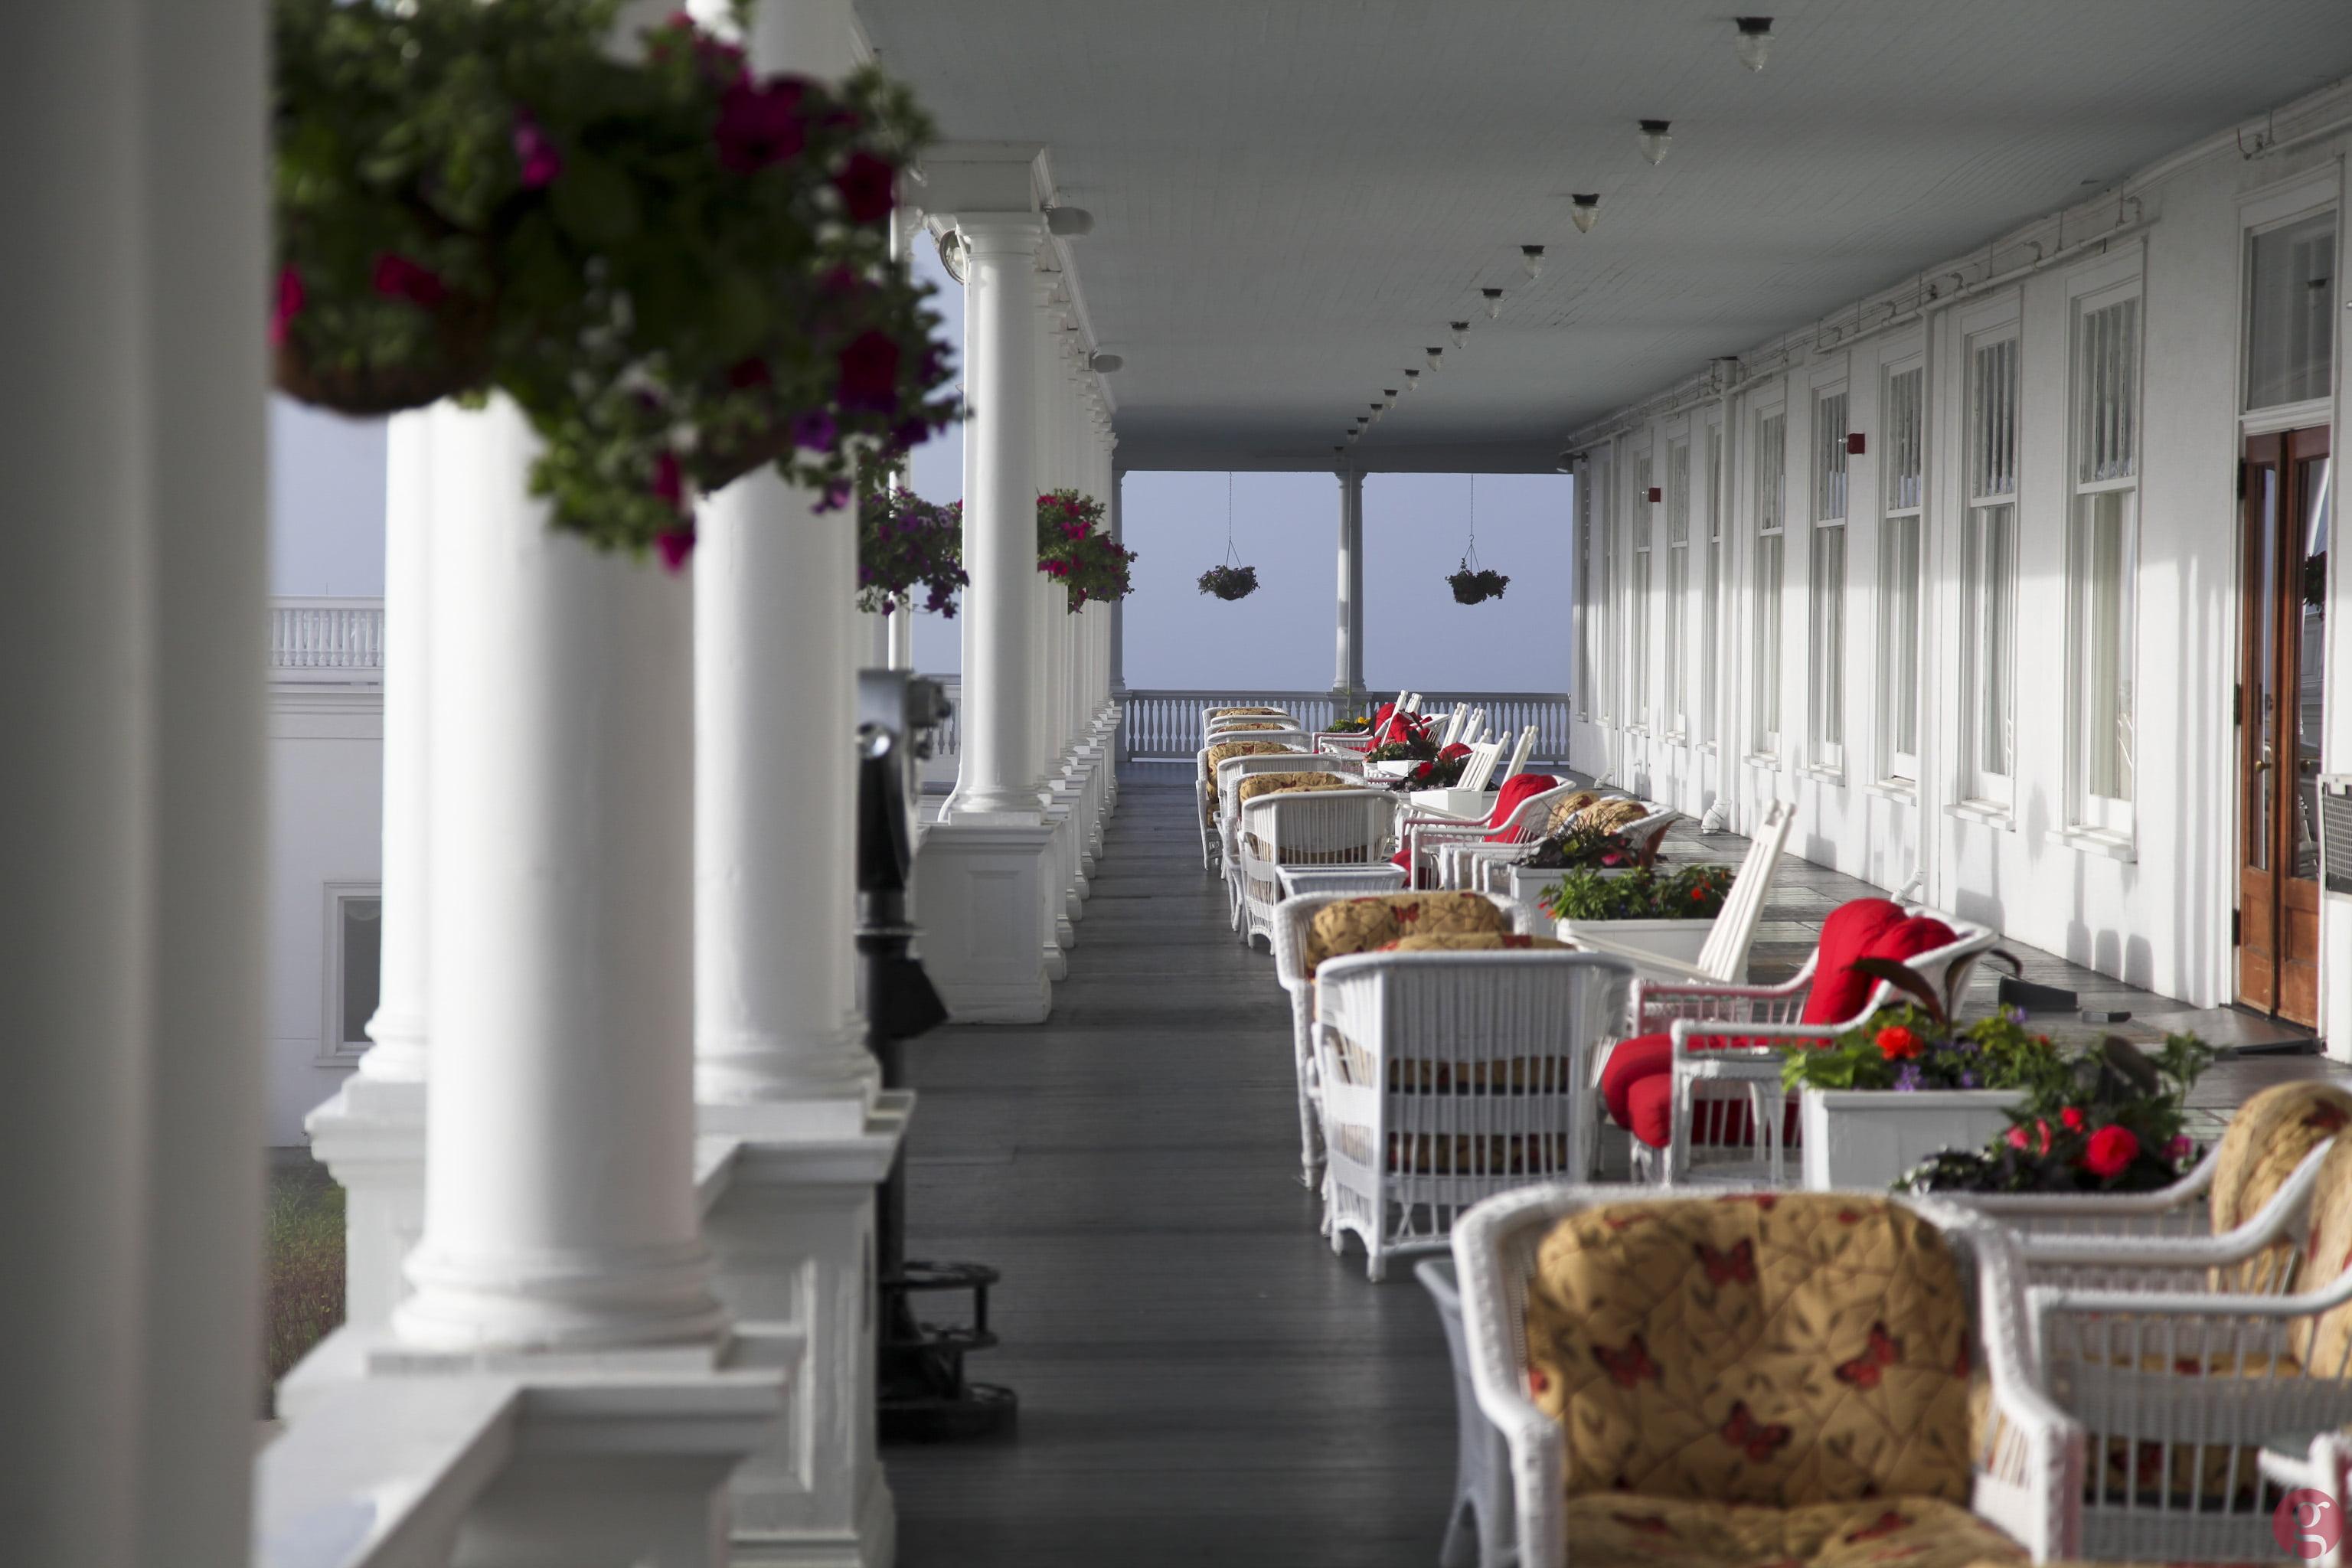 Comfy seats on the back veranda